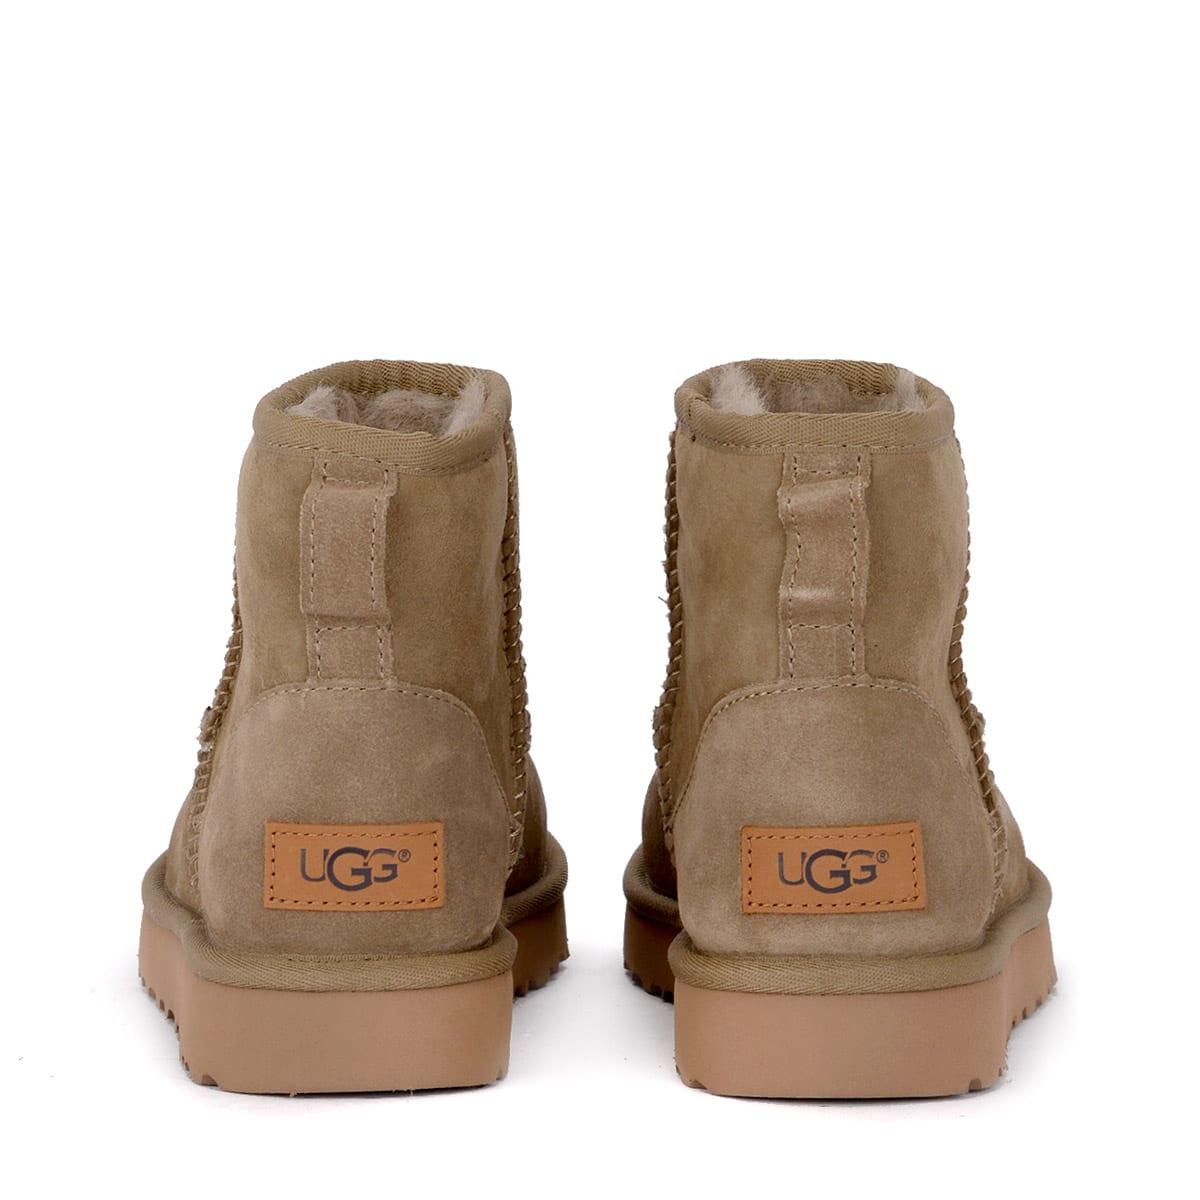 3ad57b2855b Ugg Classic Ii Mini Antelope Suede Sheepskin Ankle Boots.